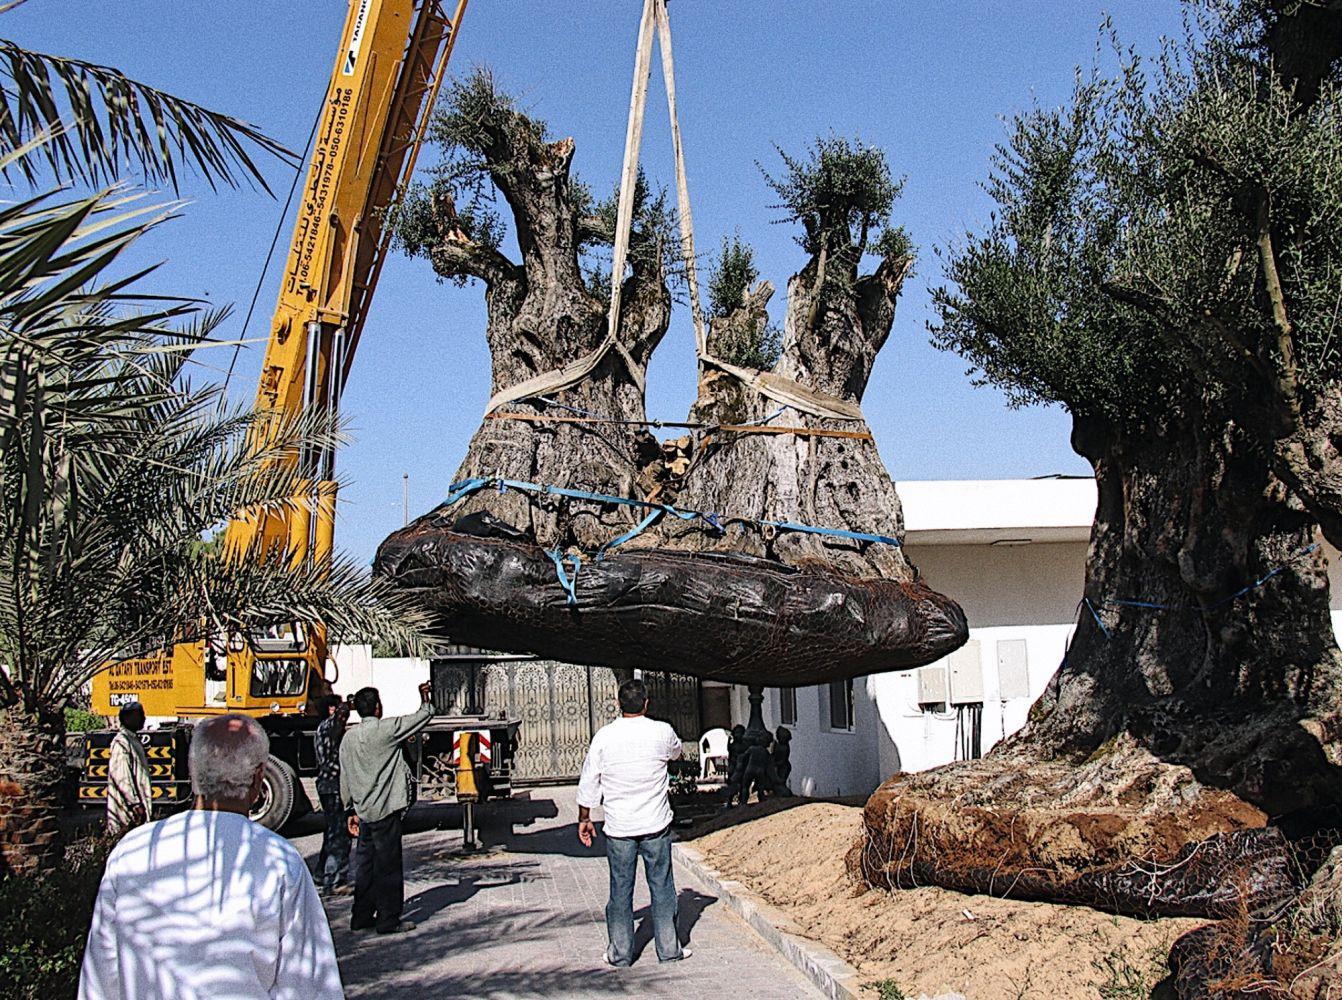 Chantier à Dubai. Plantations d'oliviers mi